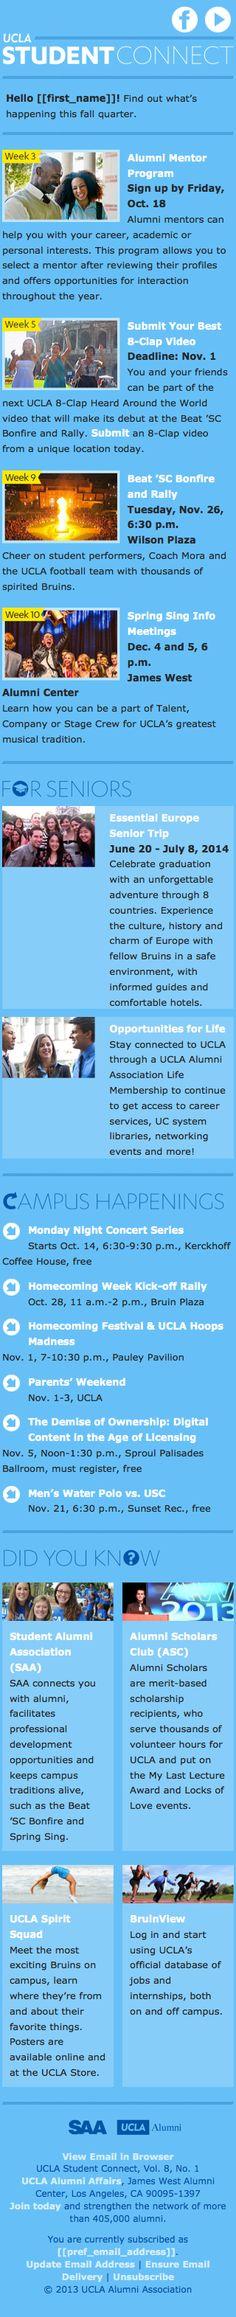 UCLA Alumni responsive email newsletter